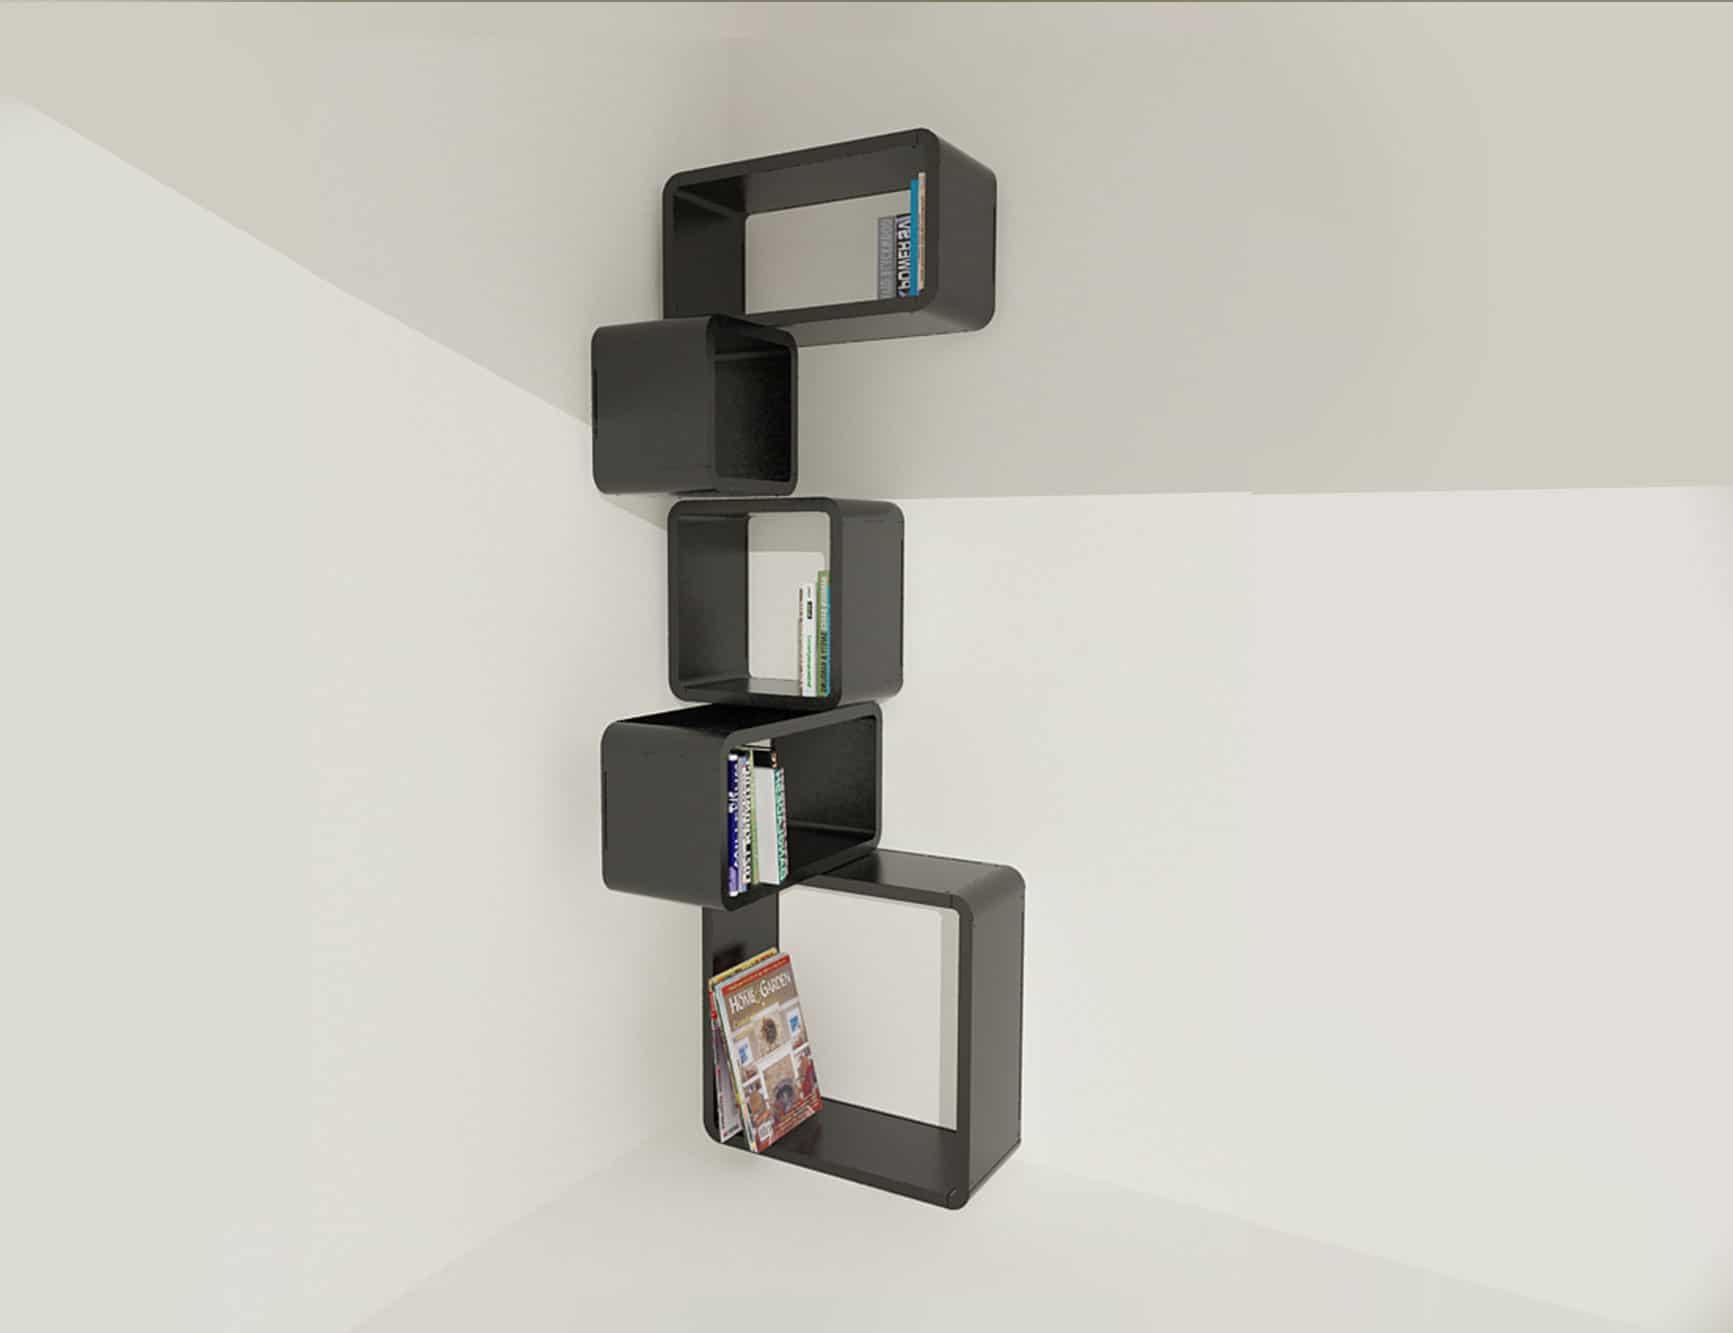 Modular Corner Cube Wall Shelf M in Black 1